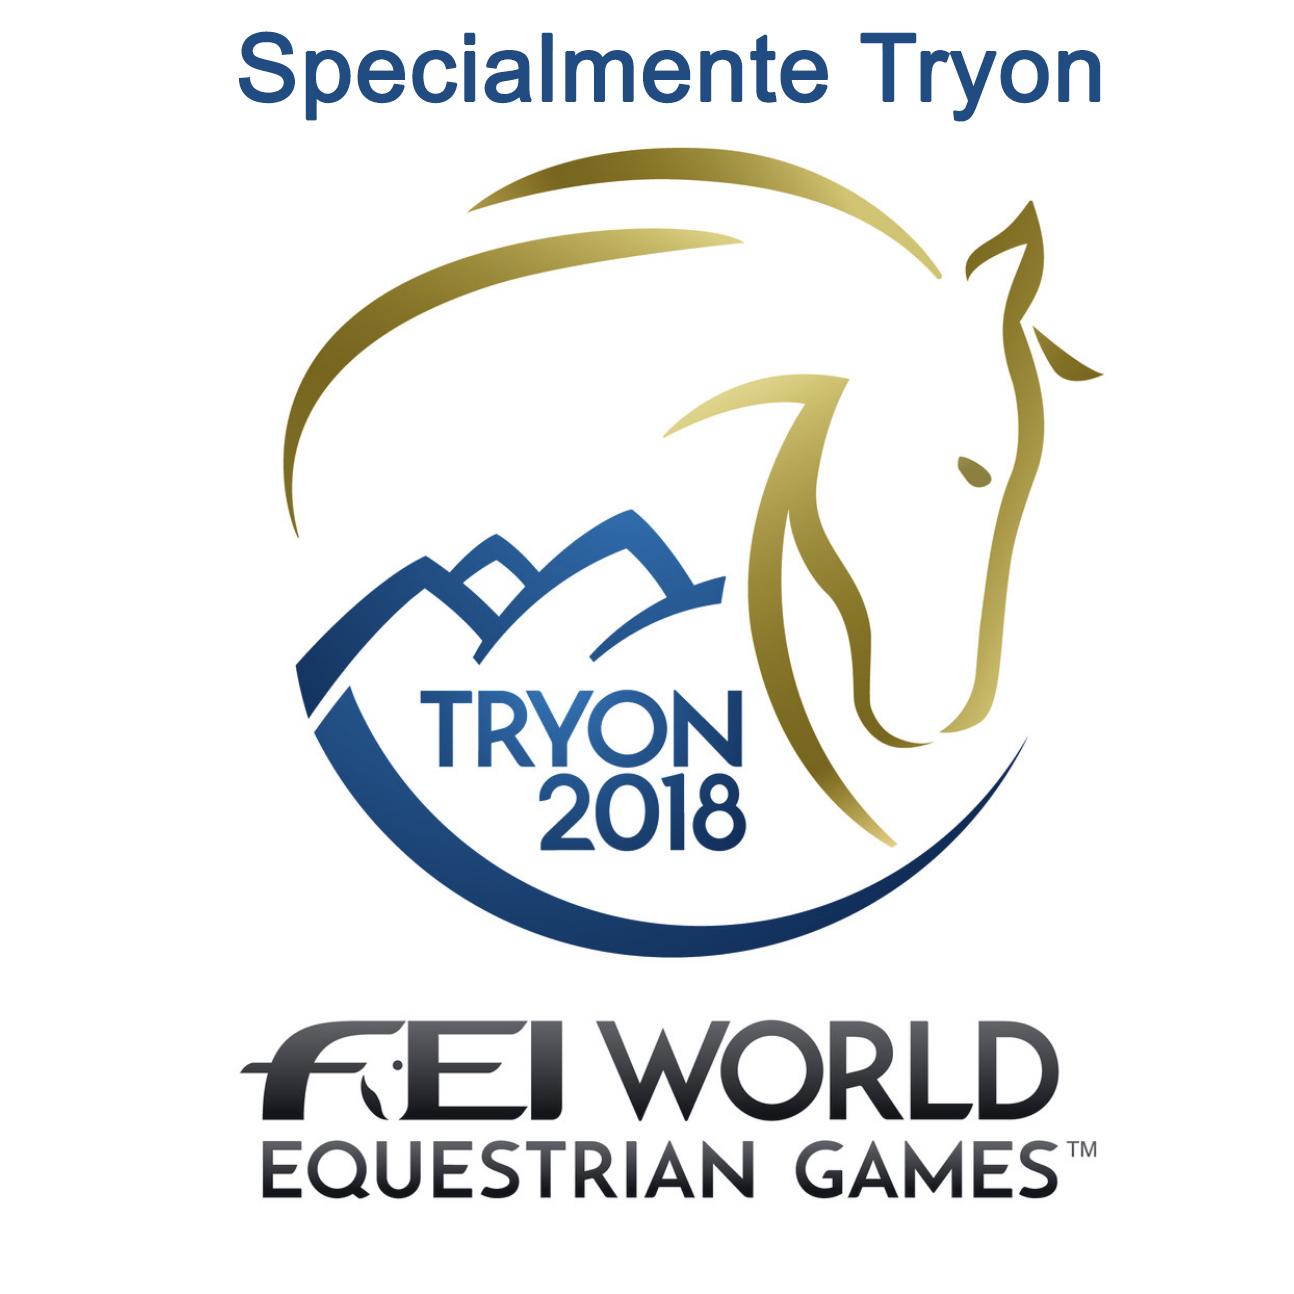 FEI World Equestrian Games-Tryon 2018